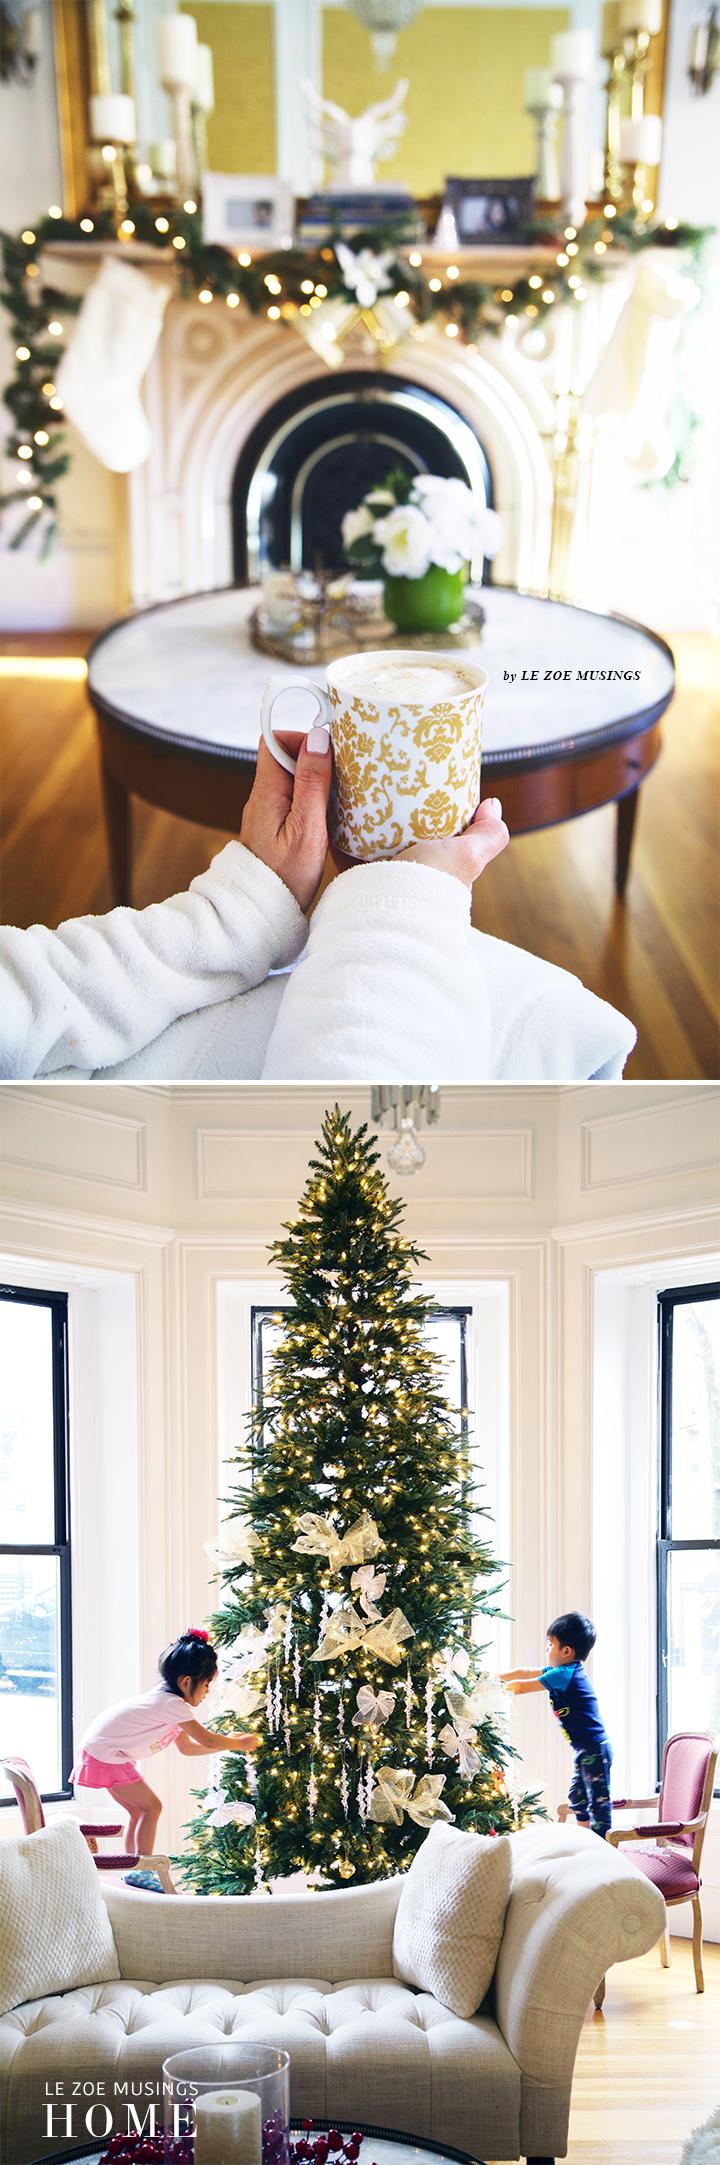 christmas-prep-by-le-zoe-musings2